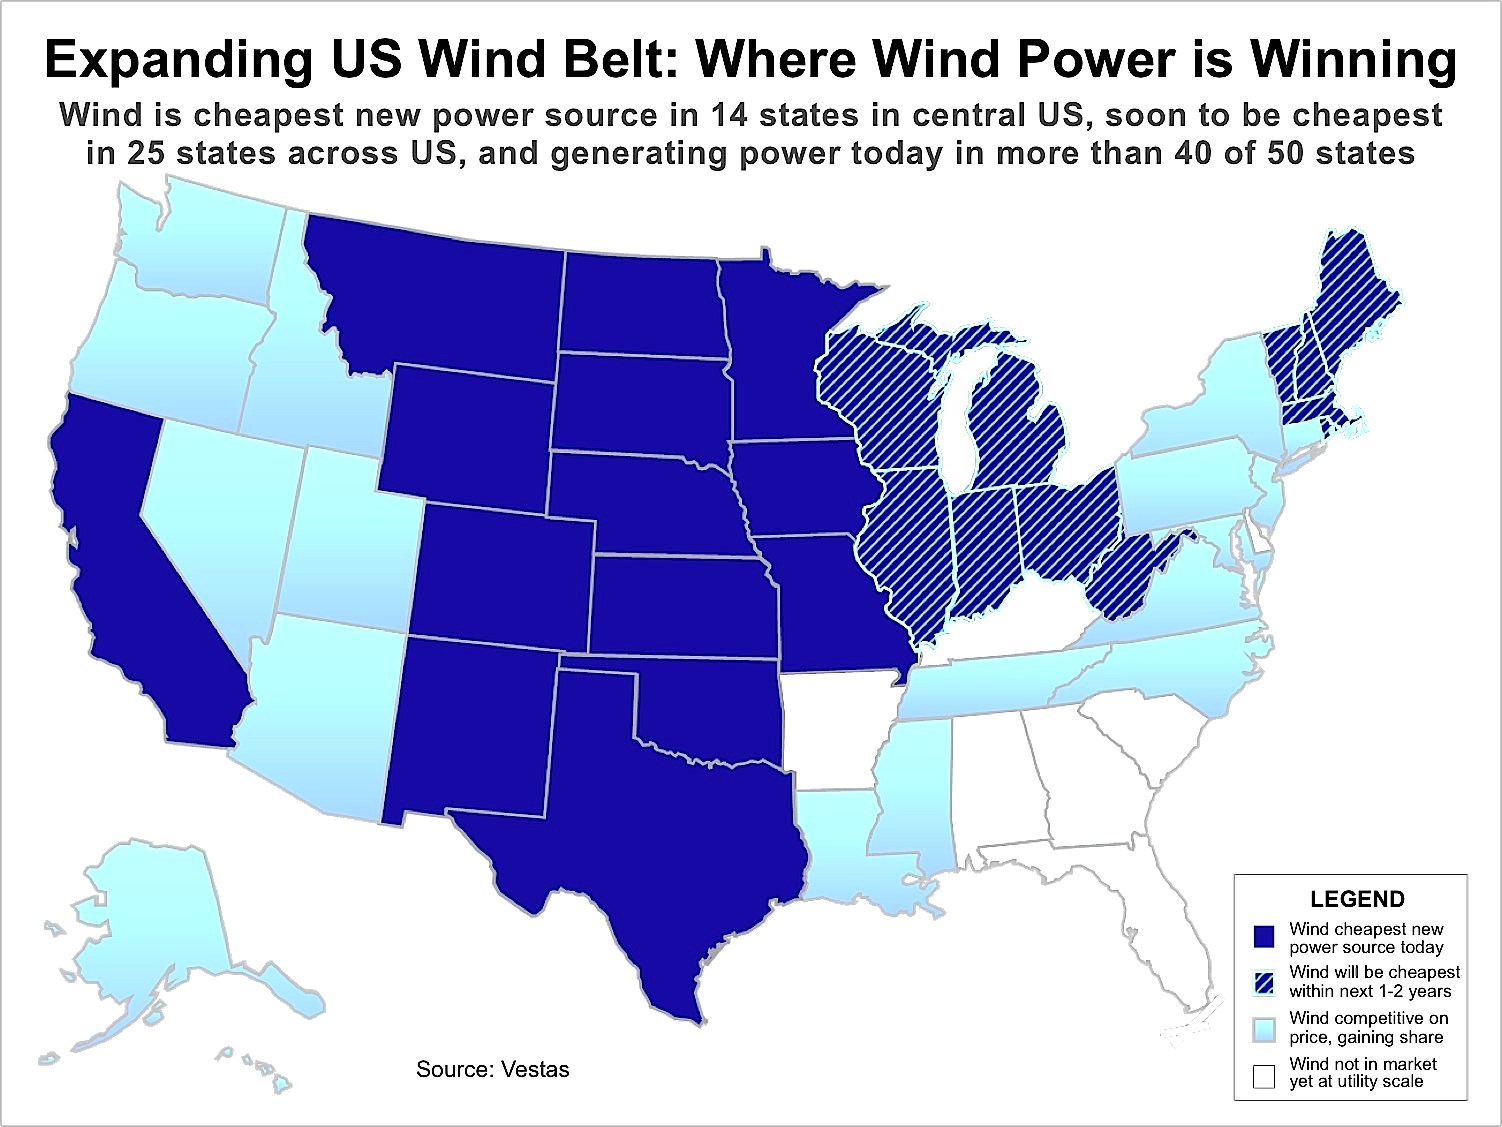 Map of Expanding US Wind Belt